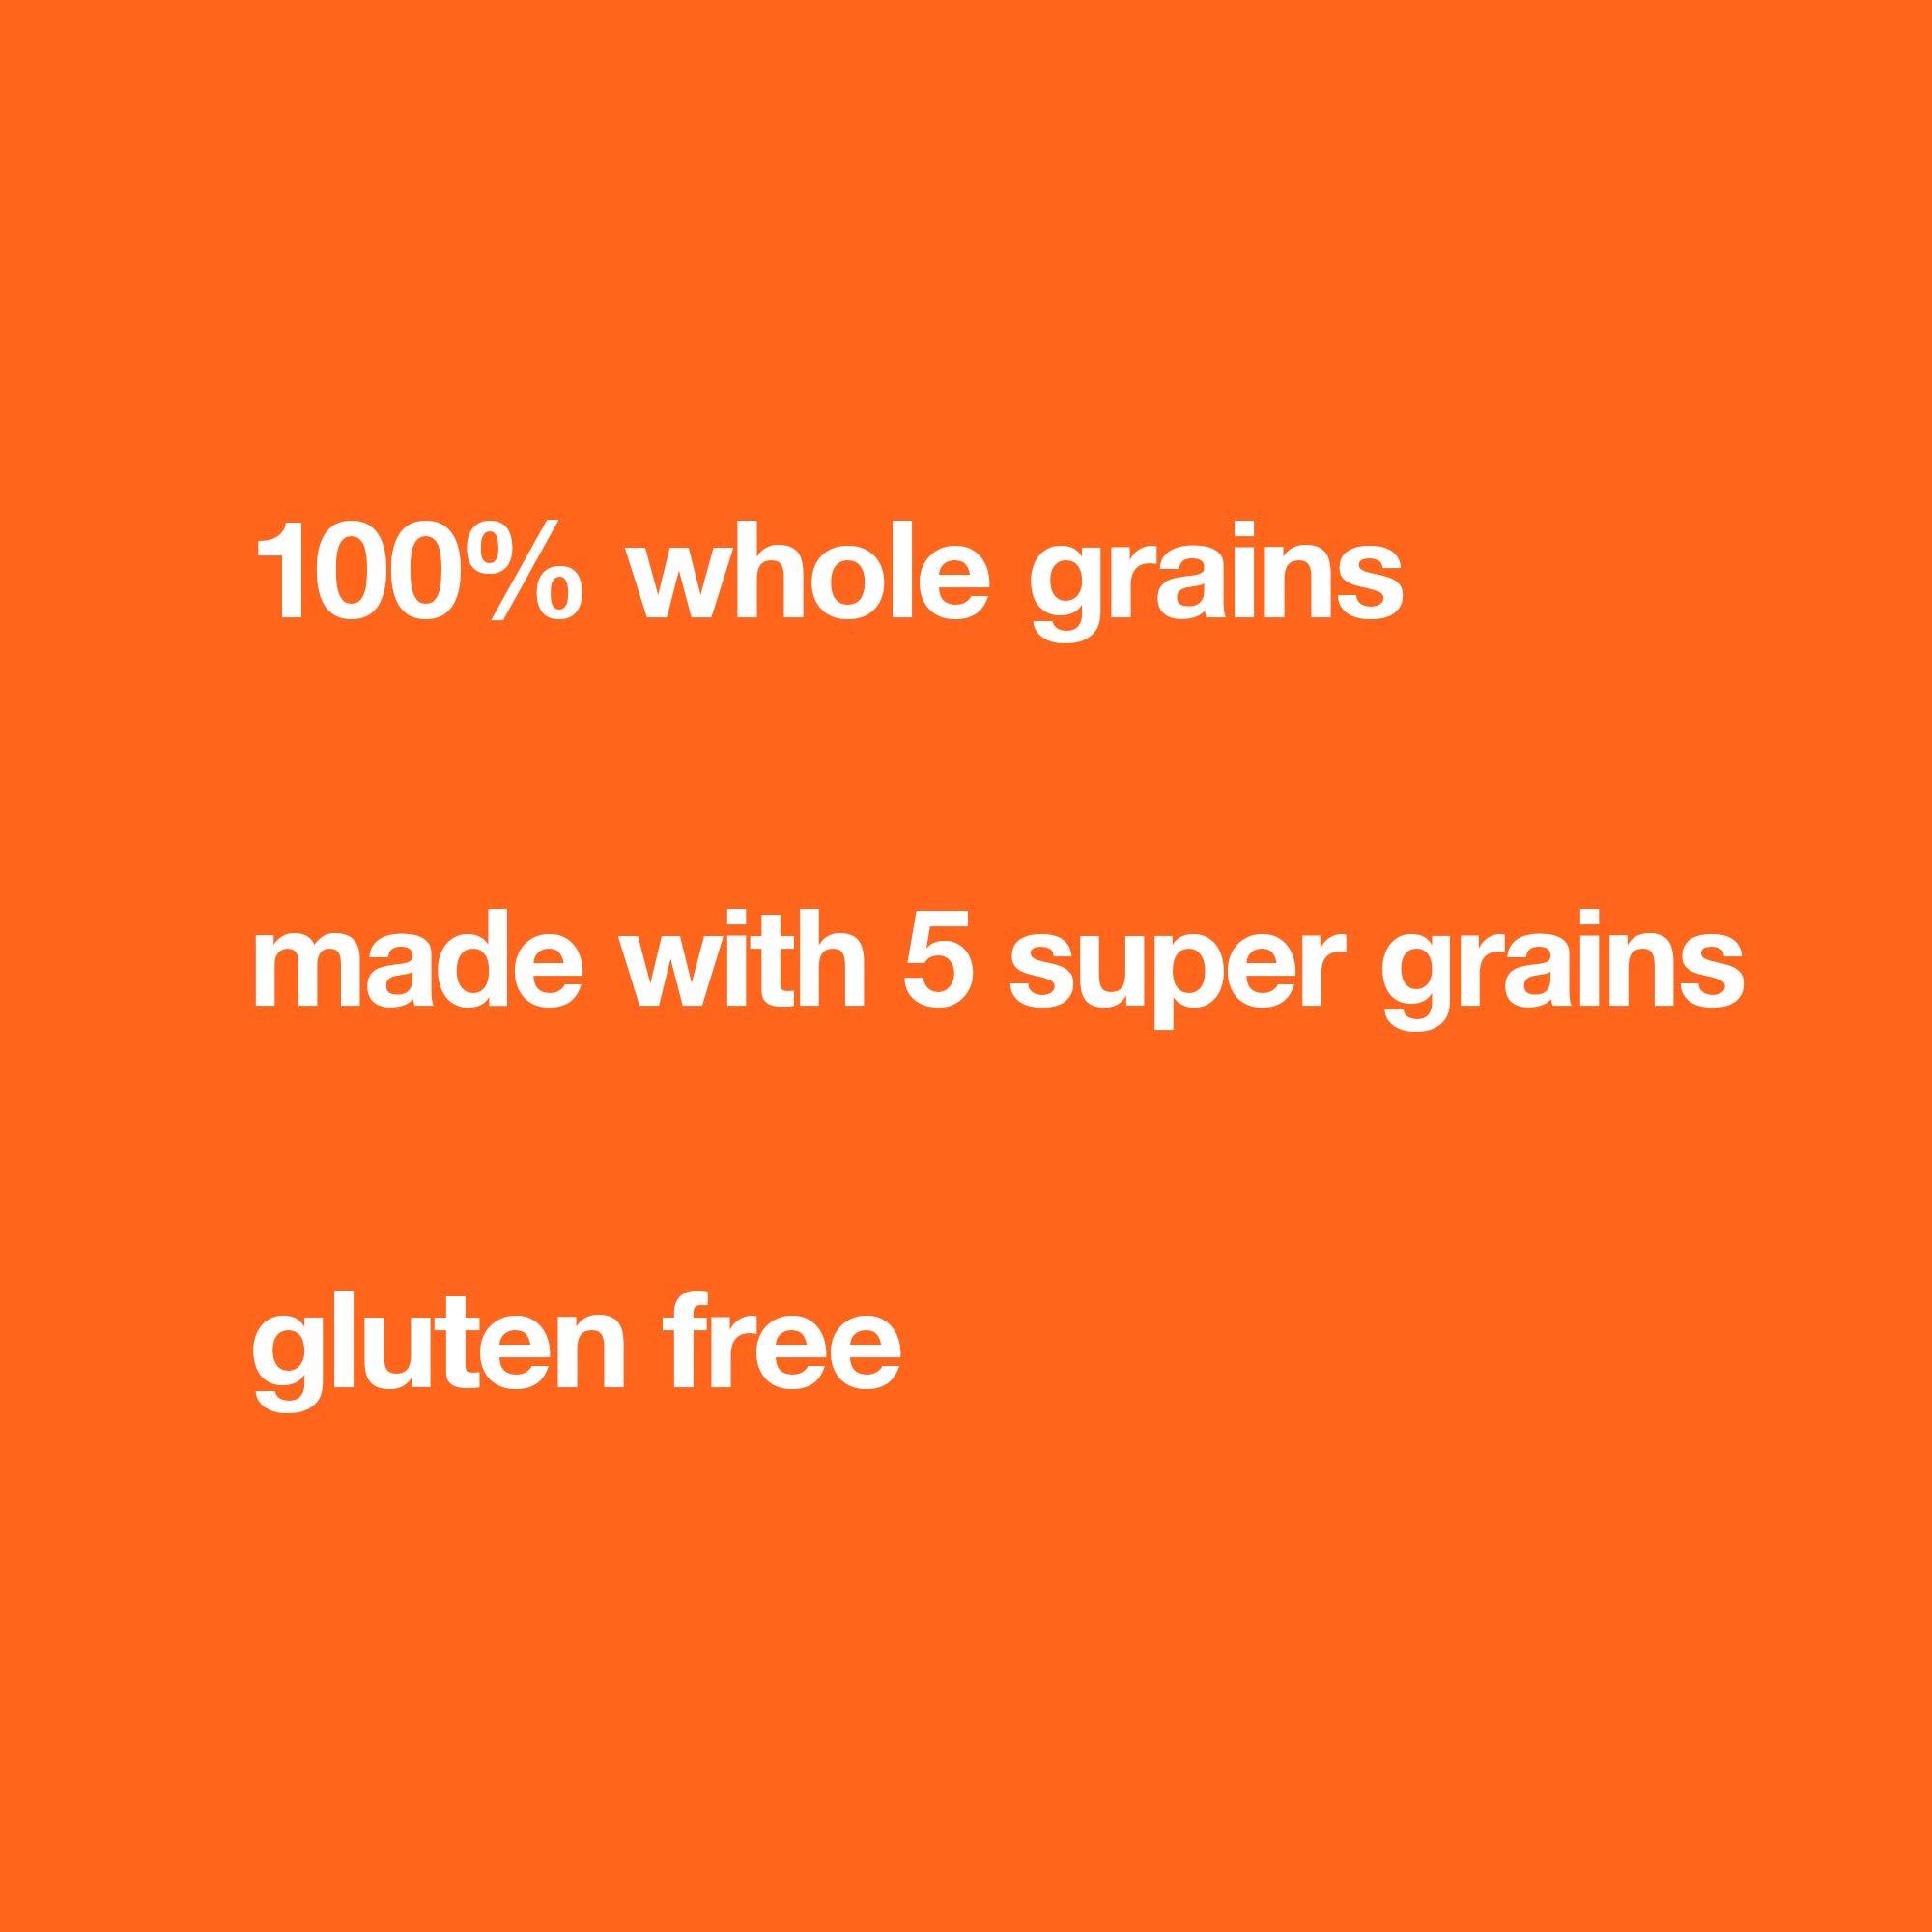 KIND Healthy Grains Granola Bars, Peanut Butter Dark Chocolate, Gluten Free, 1.2 oz, 30 Count by KIND (Image #3)